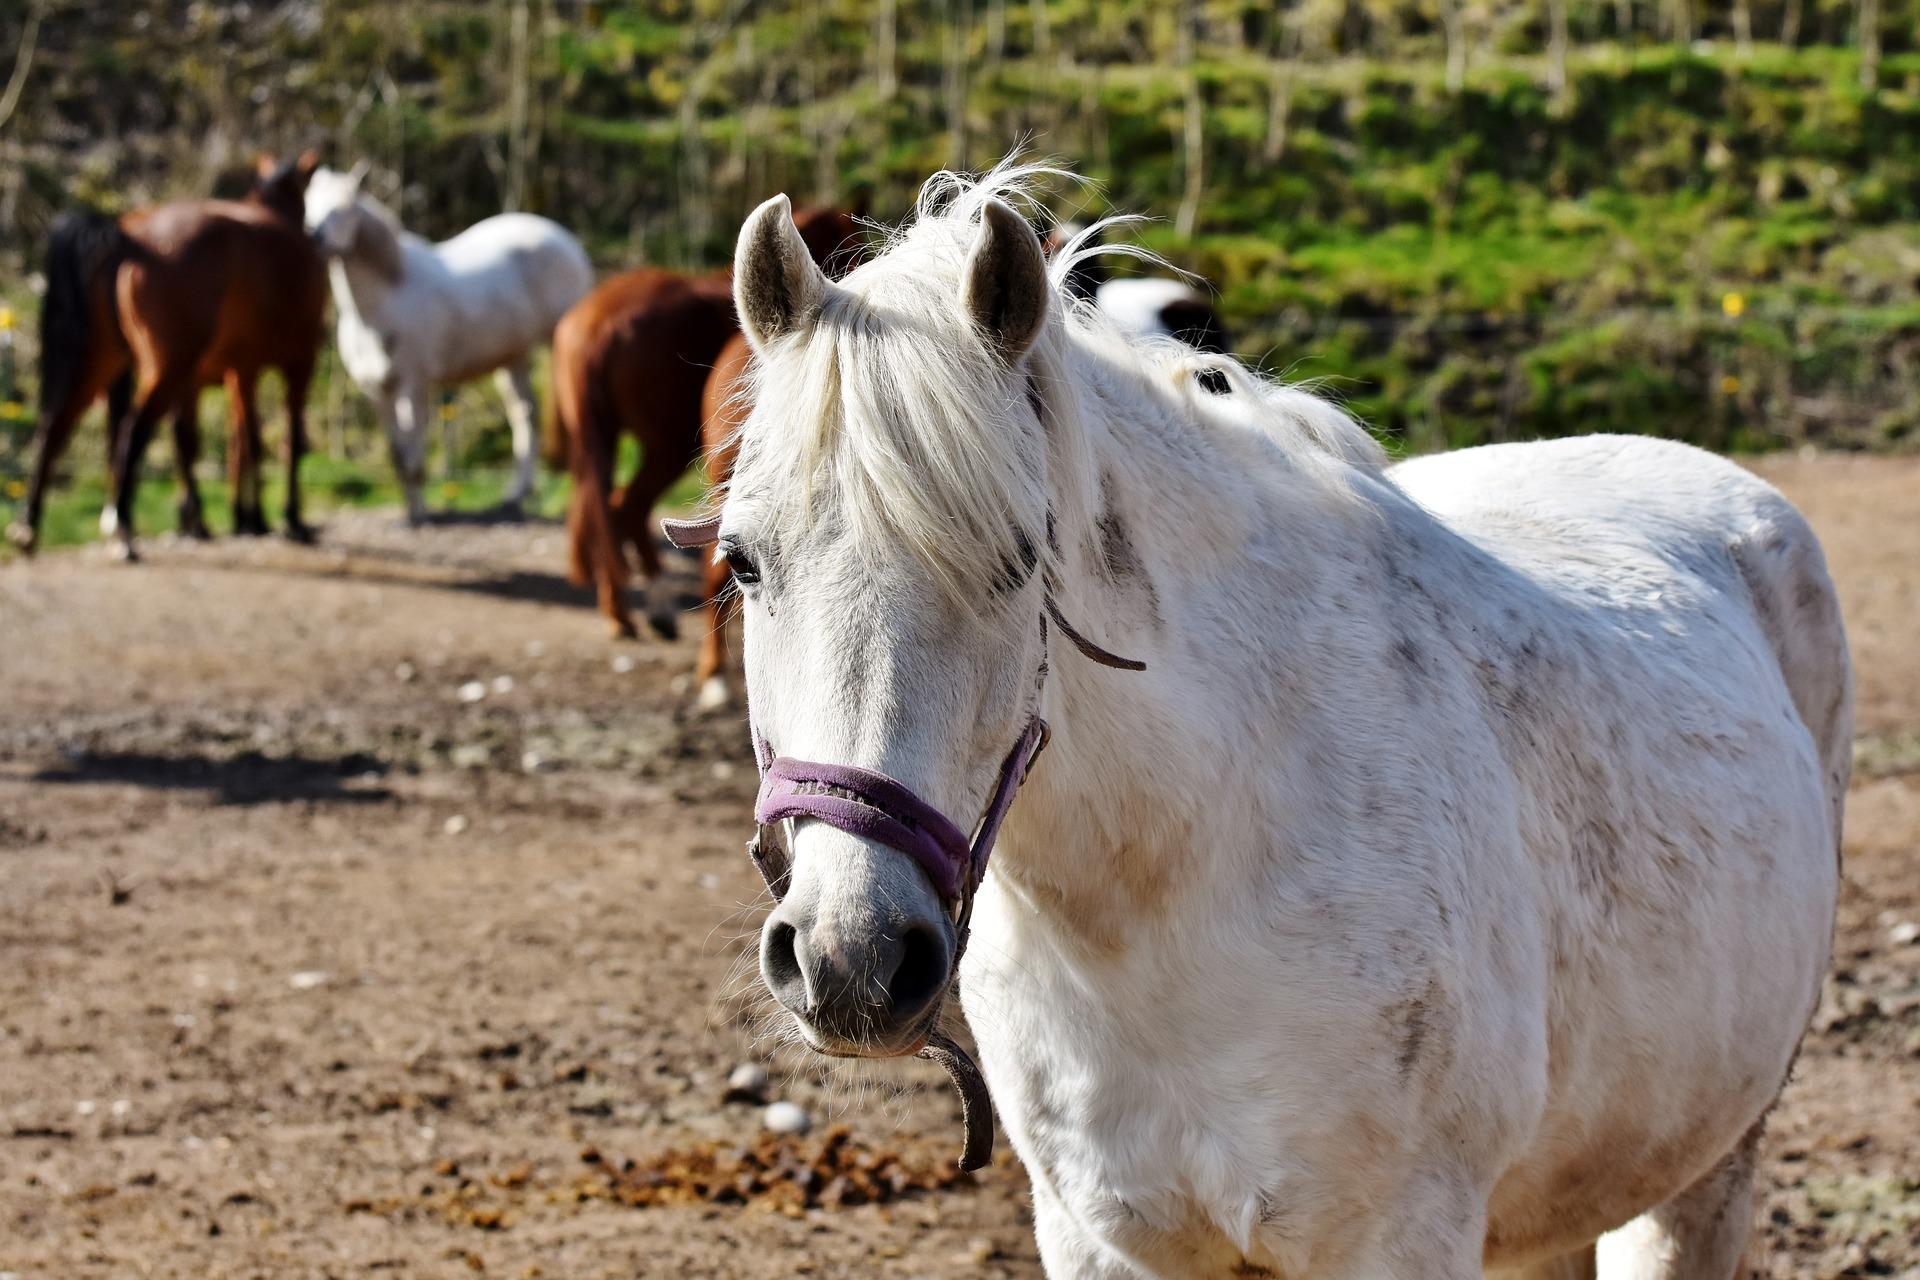 Horseback Riding Lessons Business Management